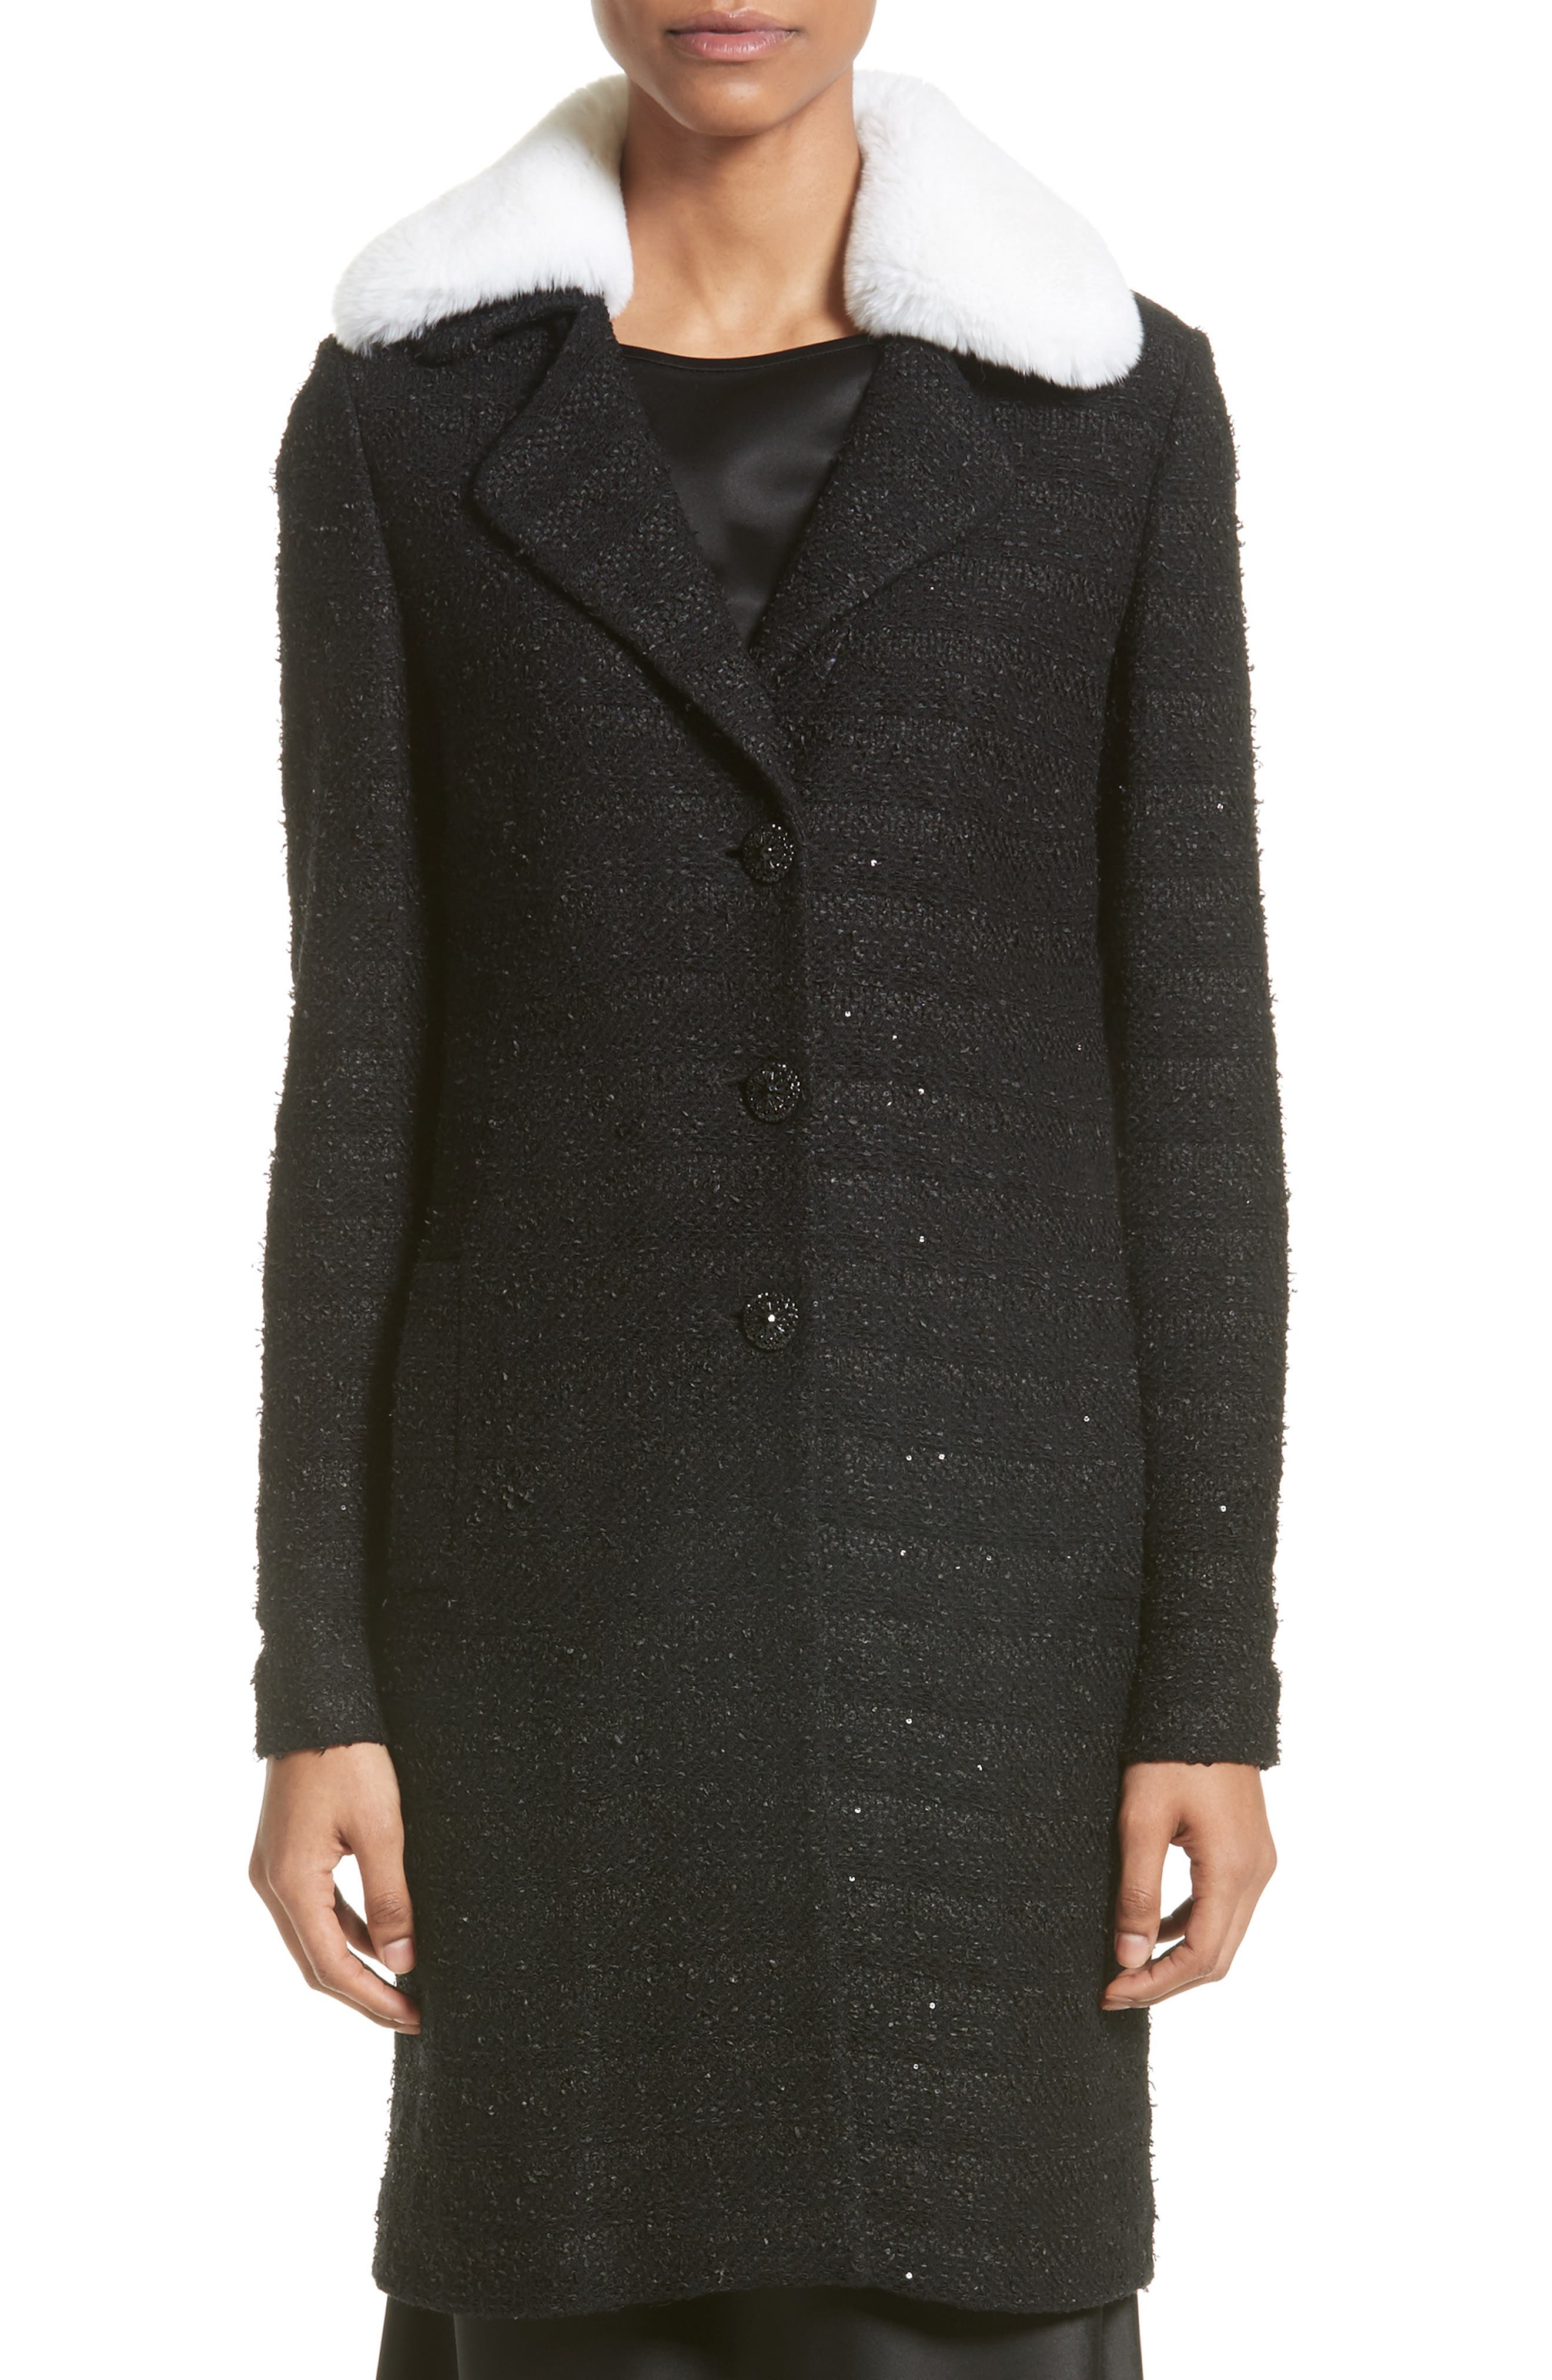 Sequin Knit Topper with Detachable Genuine Rabbit Fur Collar,                         Main,                         color, Caviar/ Bianco